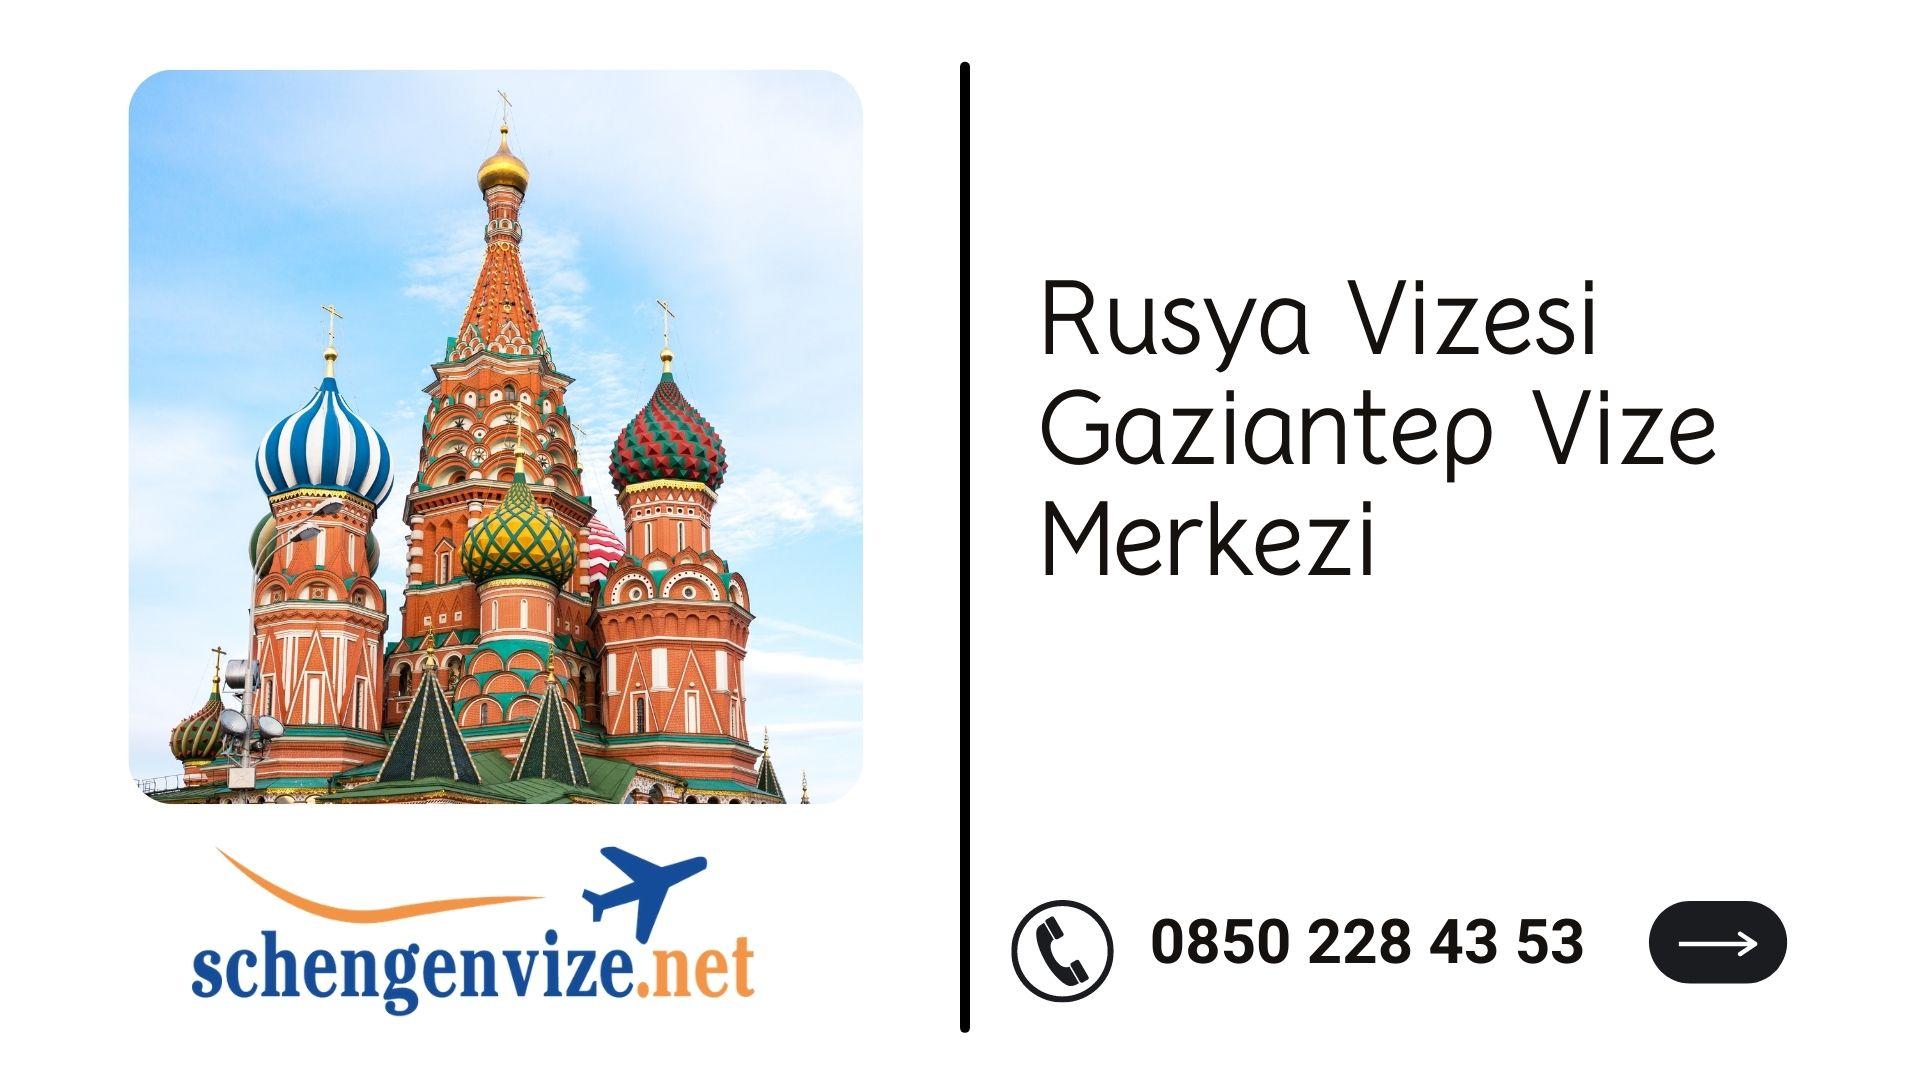 Rusya Vizesi Gaziantep Vize Merkezi